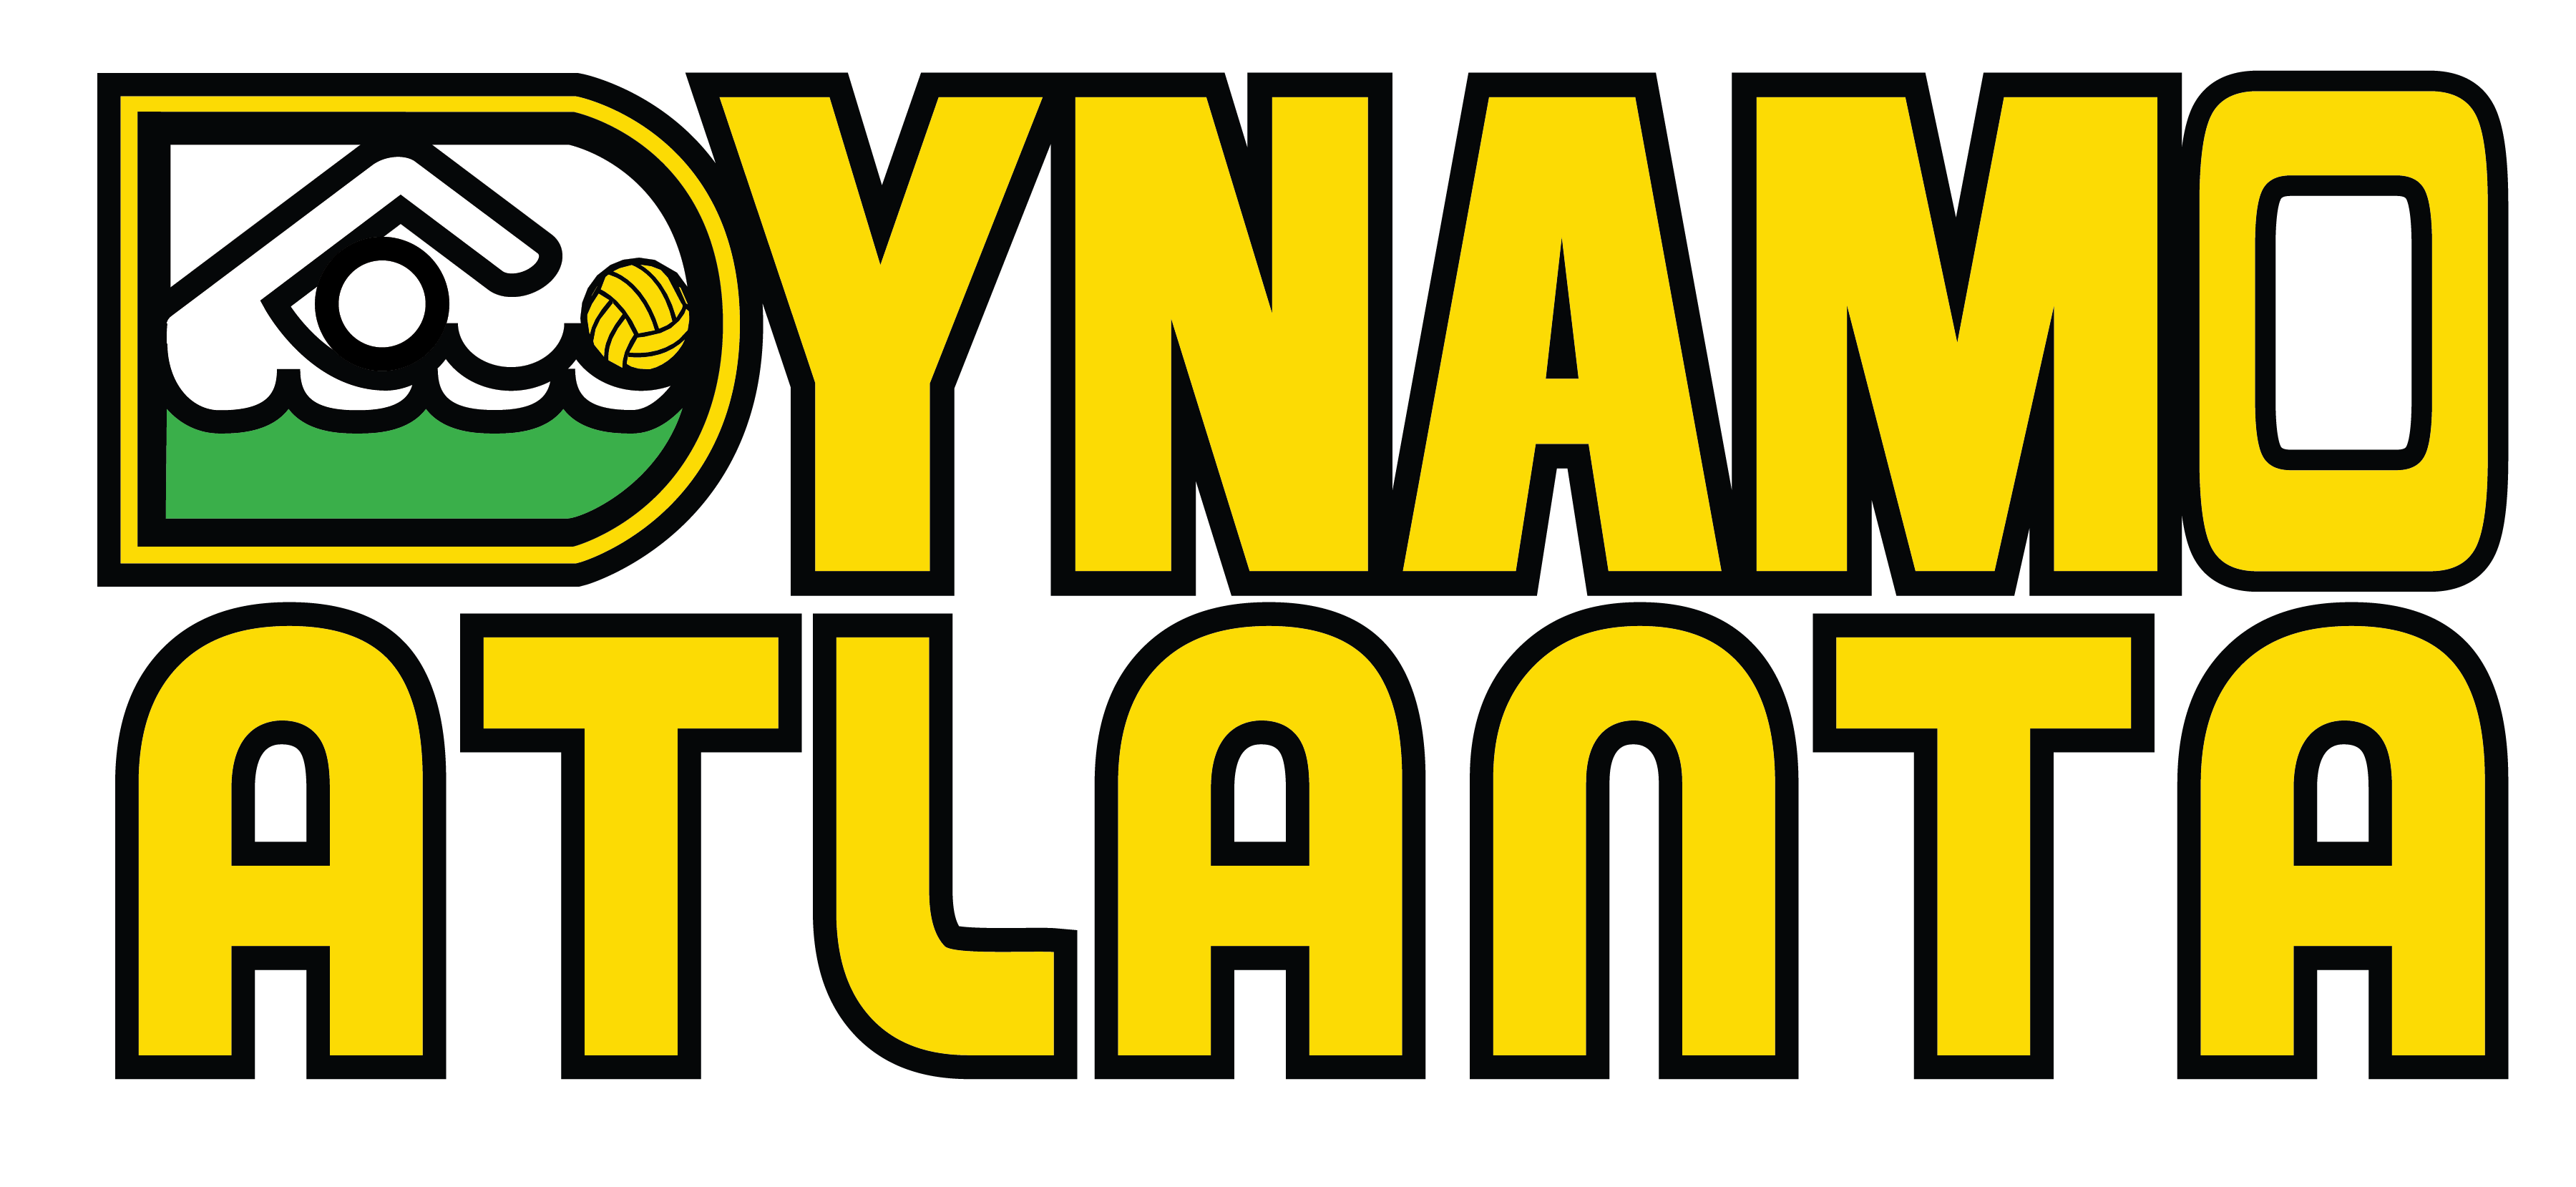 dynamo-logo-for-printful-01.png